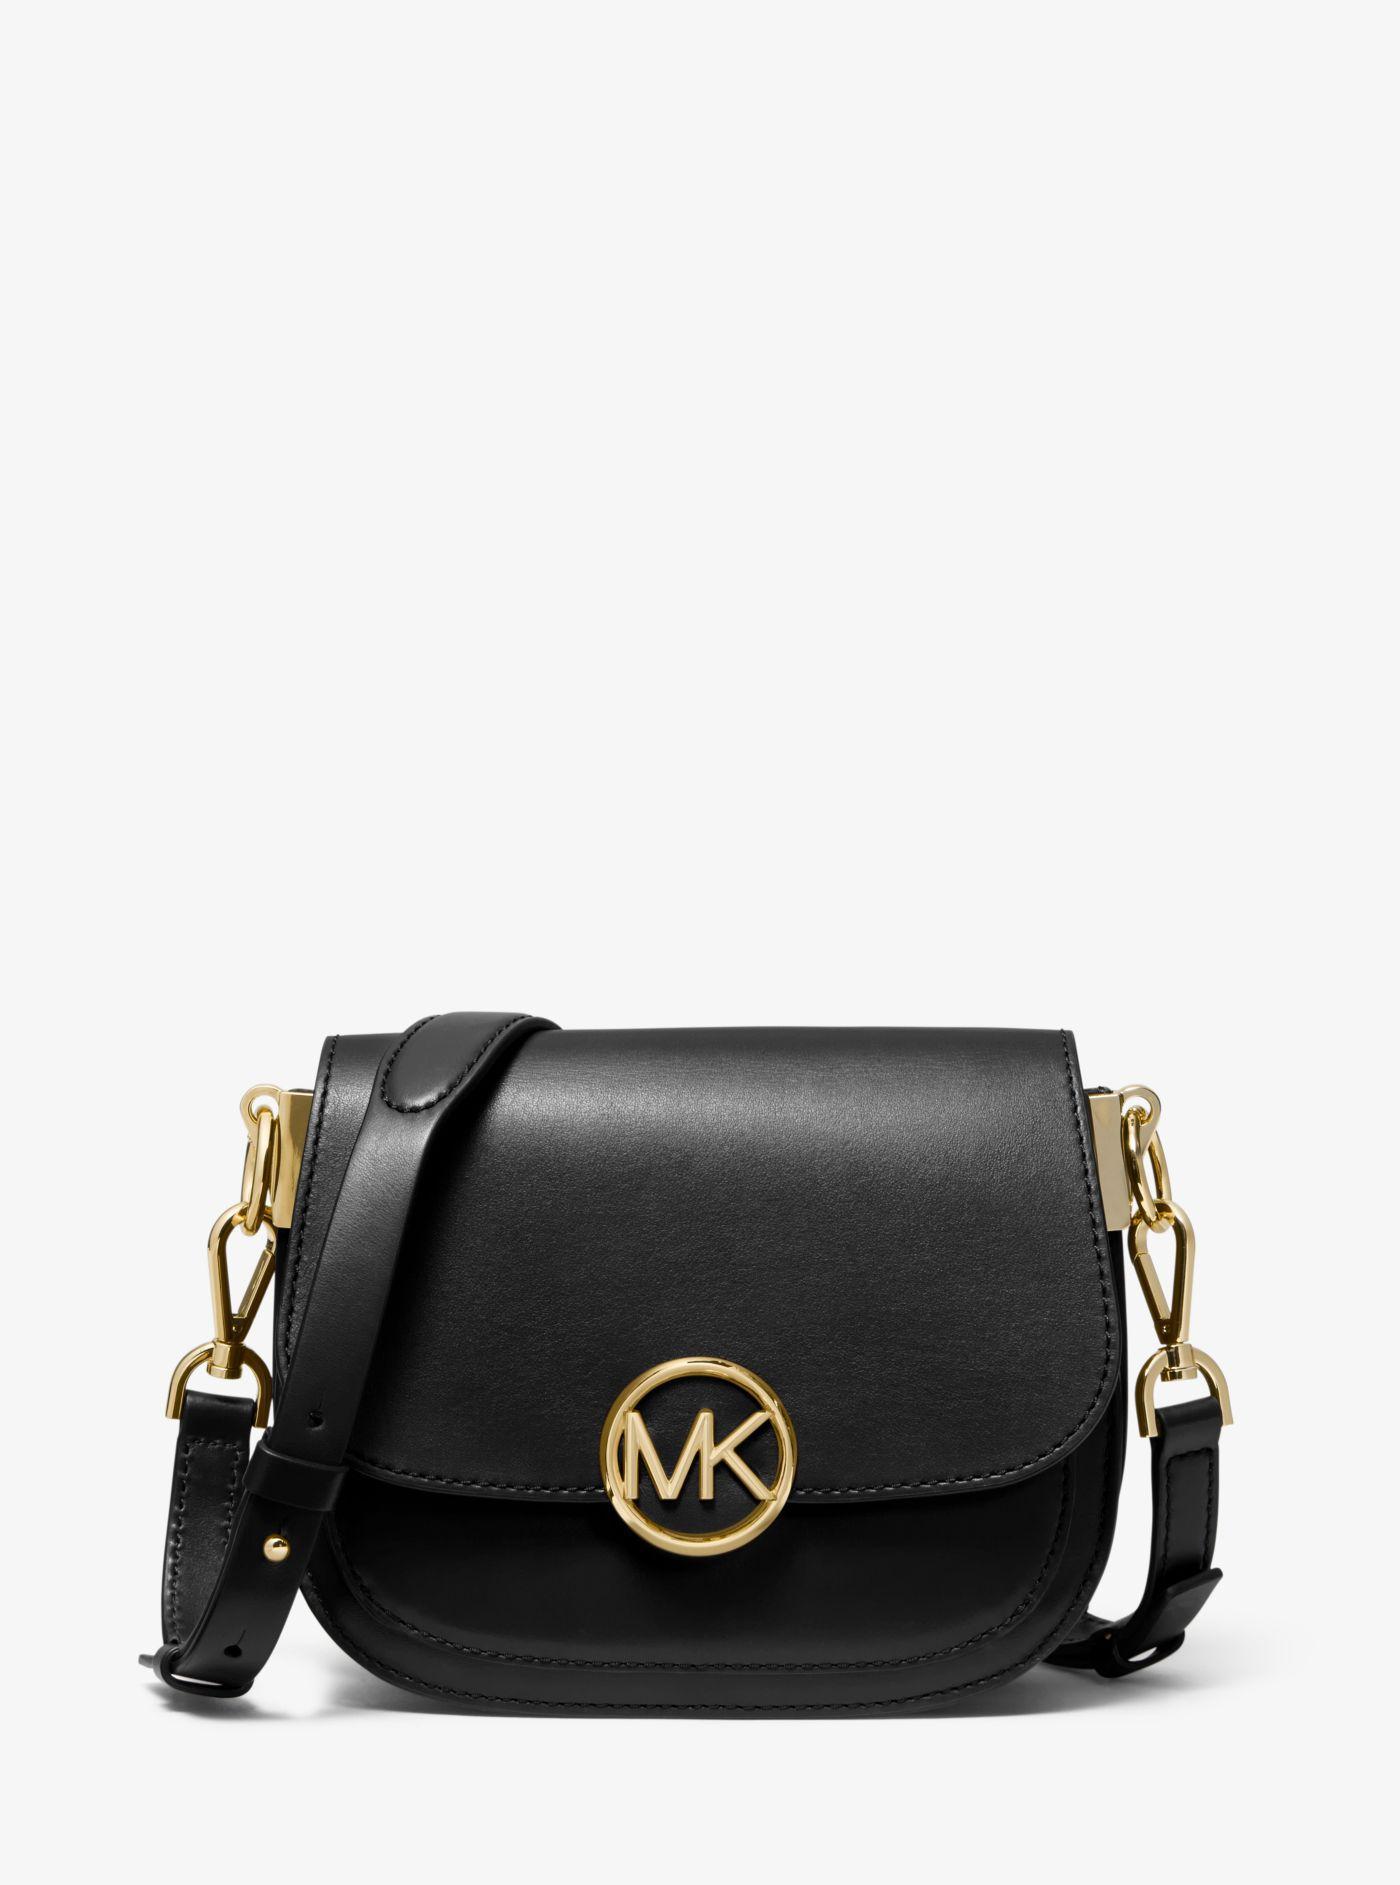 82c47813988 Lyst - Petit sac brun amande Lillie en cuir Michael Kors en coloris Noir